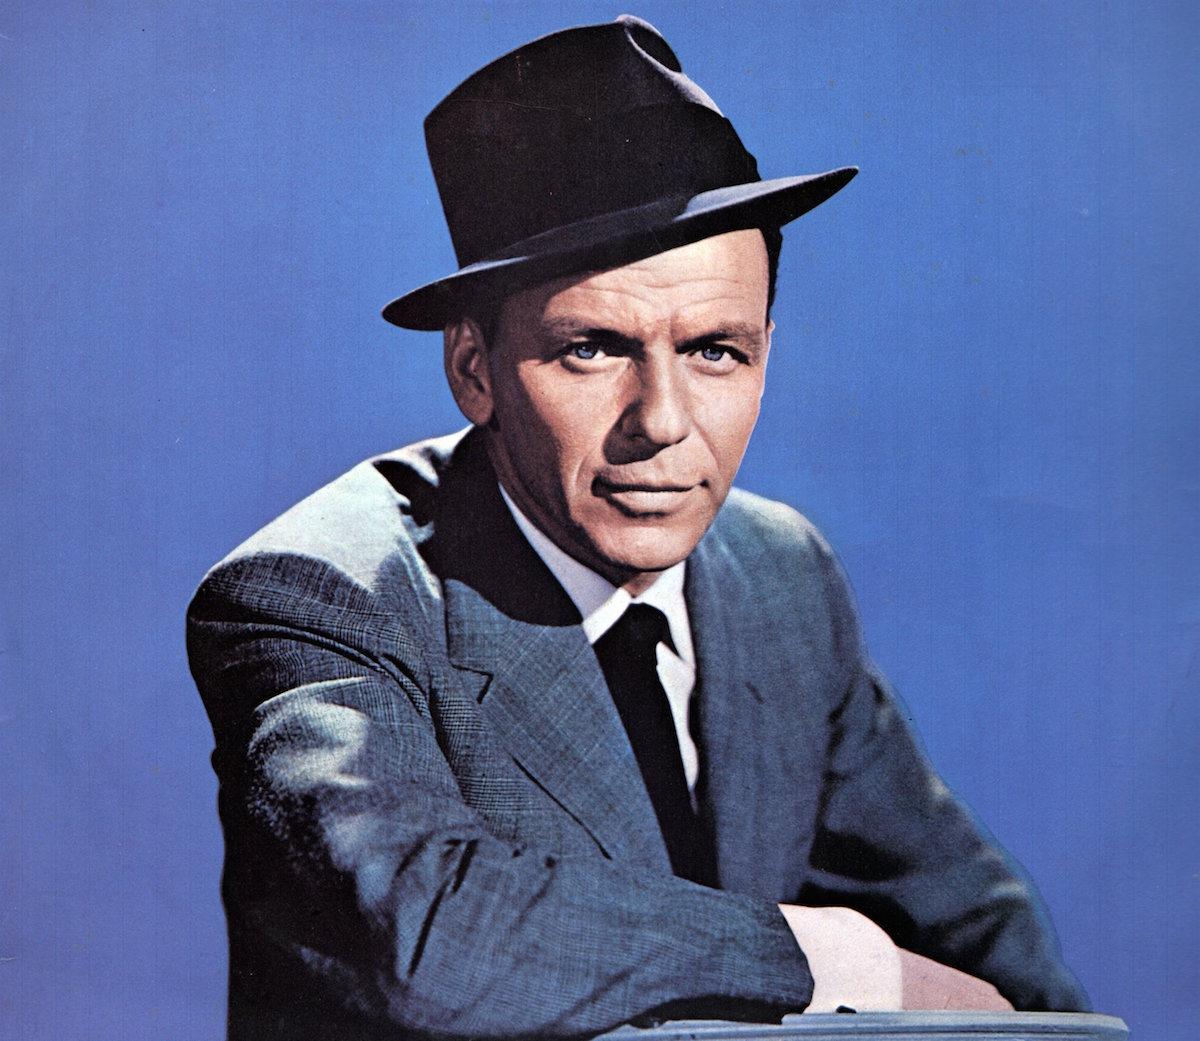 Frank Sinatra circa 1960